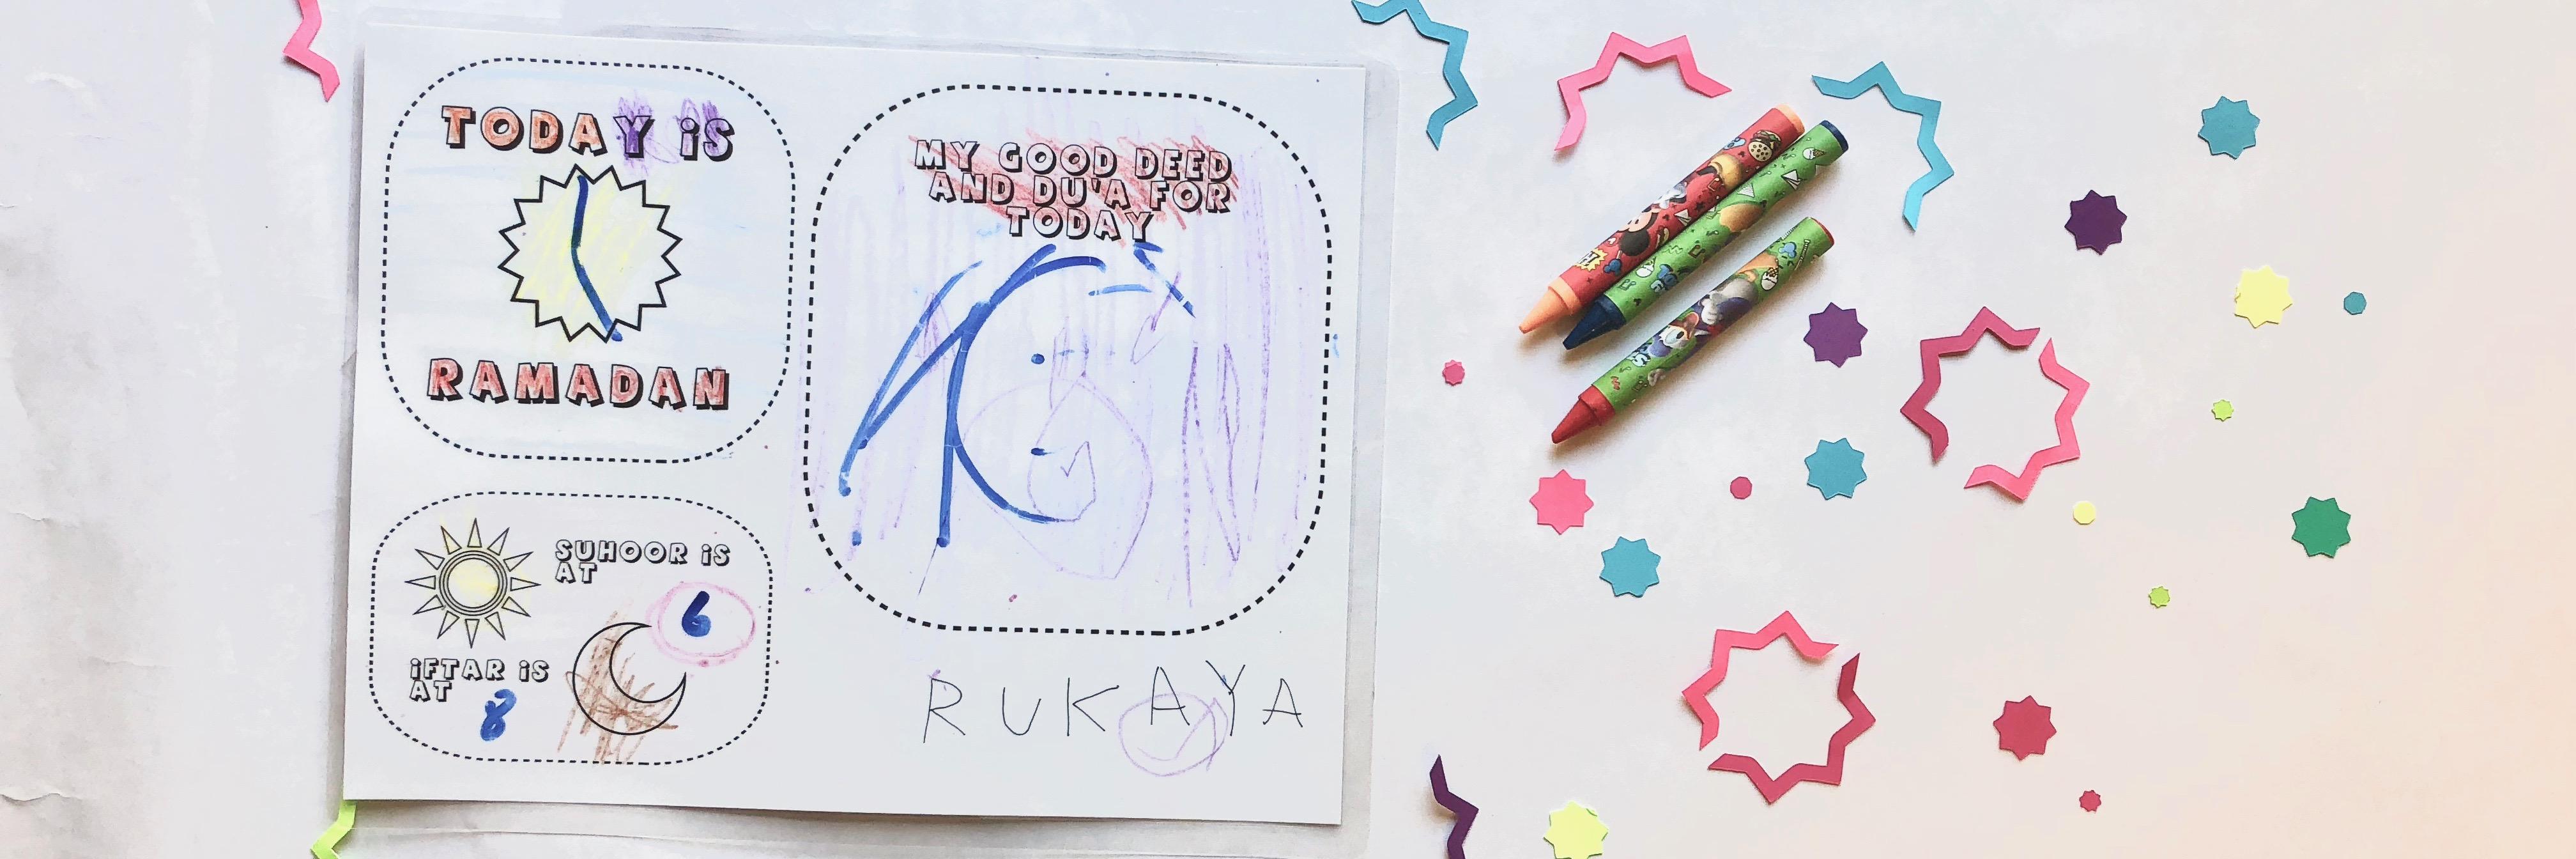 FREE DIY Placemat Printable   Ramadan Mubarak!